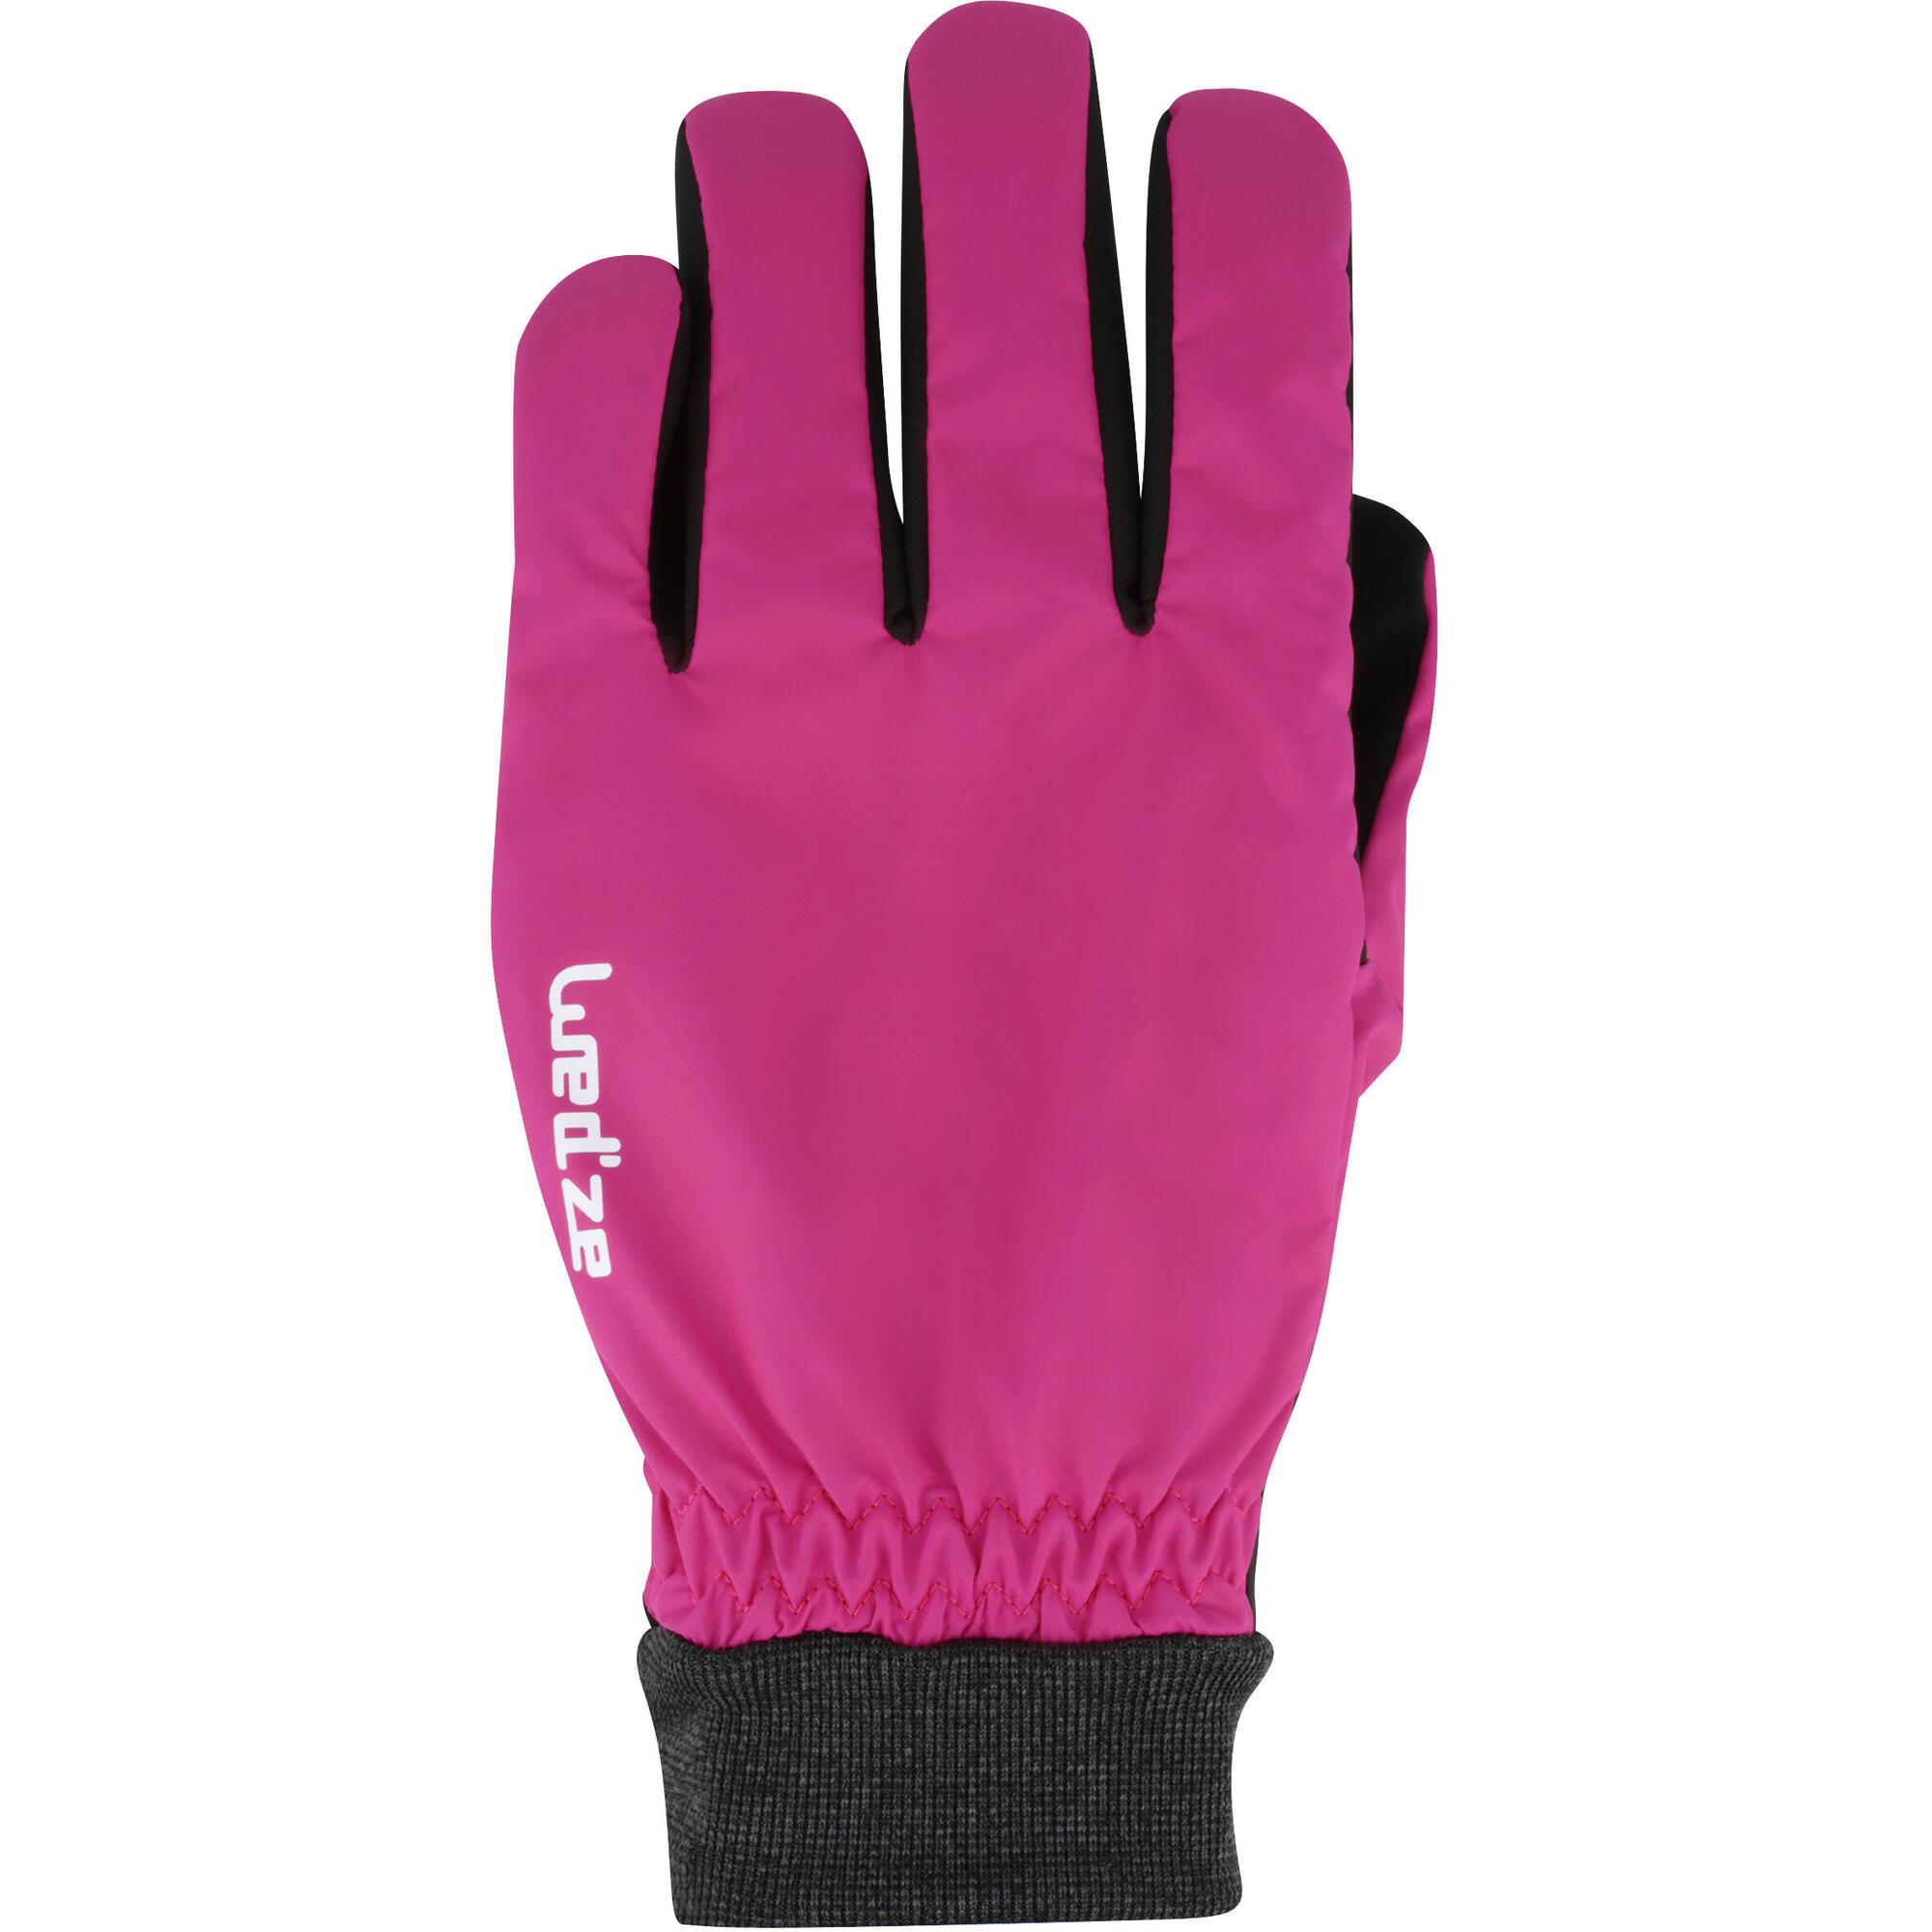 gants de ski de piste adulte warm fit roses wedze. Black Bedroom Furniture Sets. Home Design Ideas